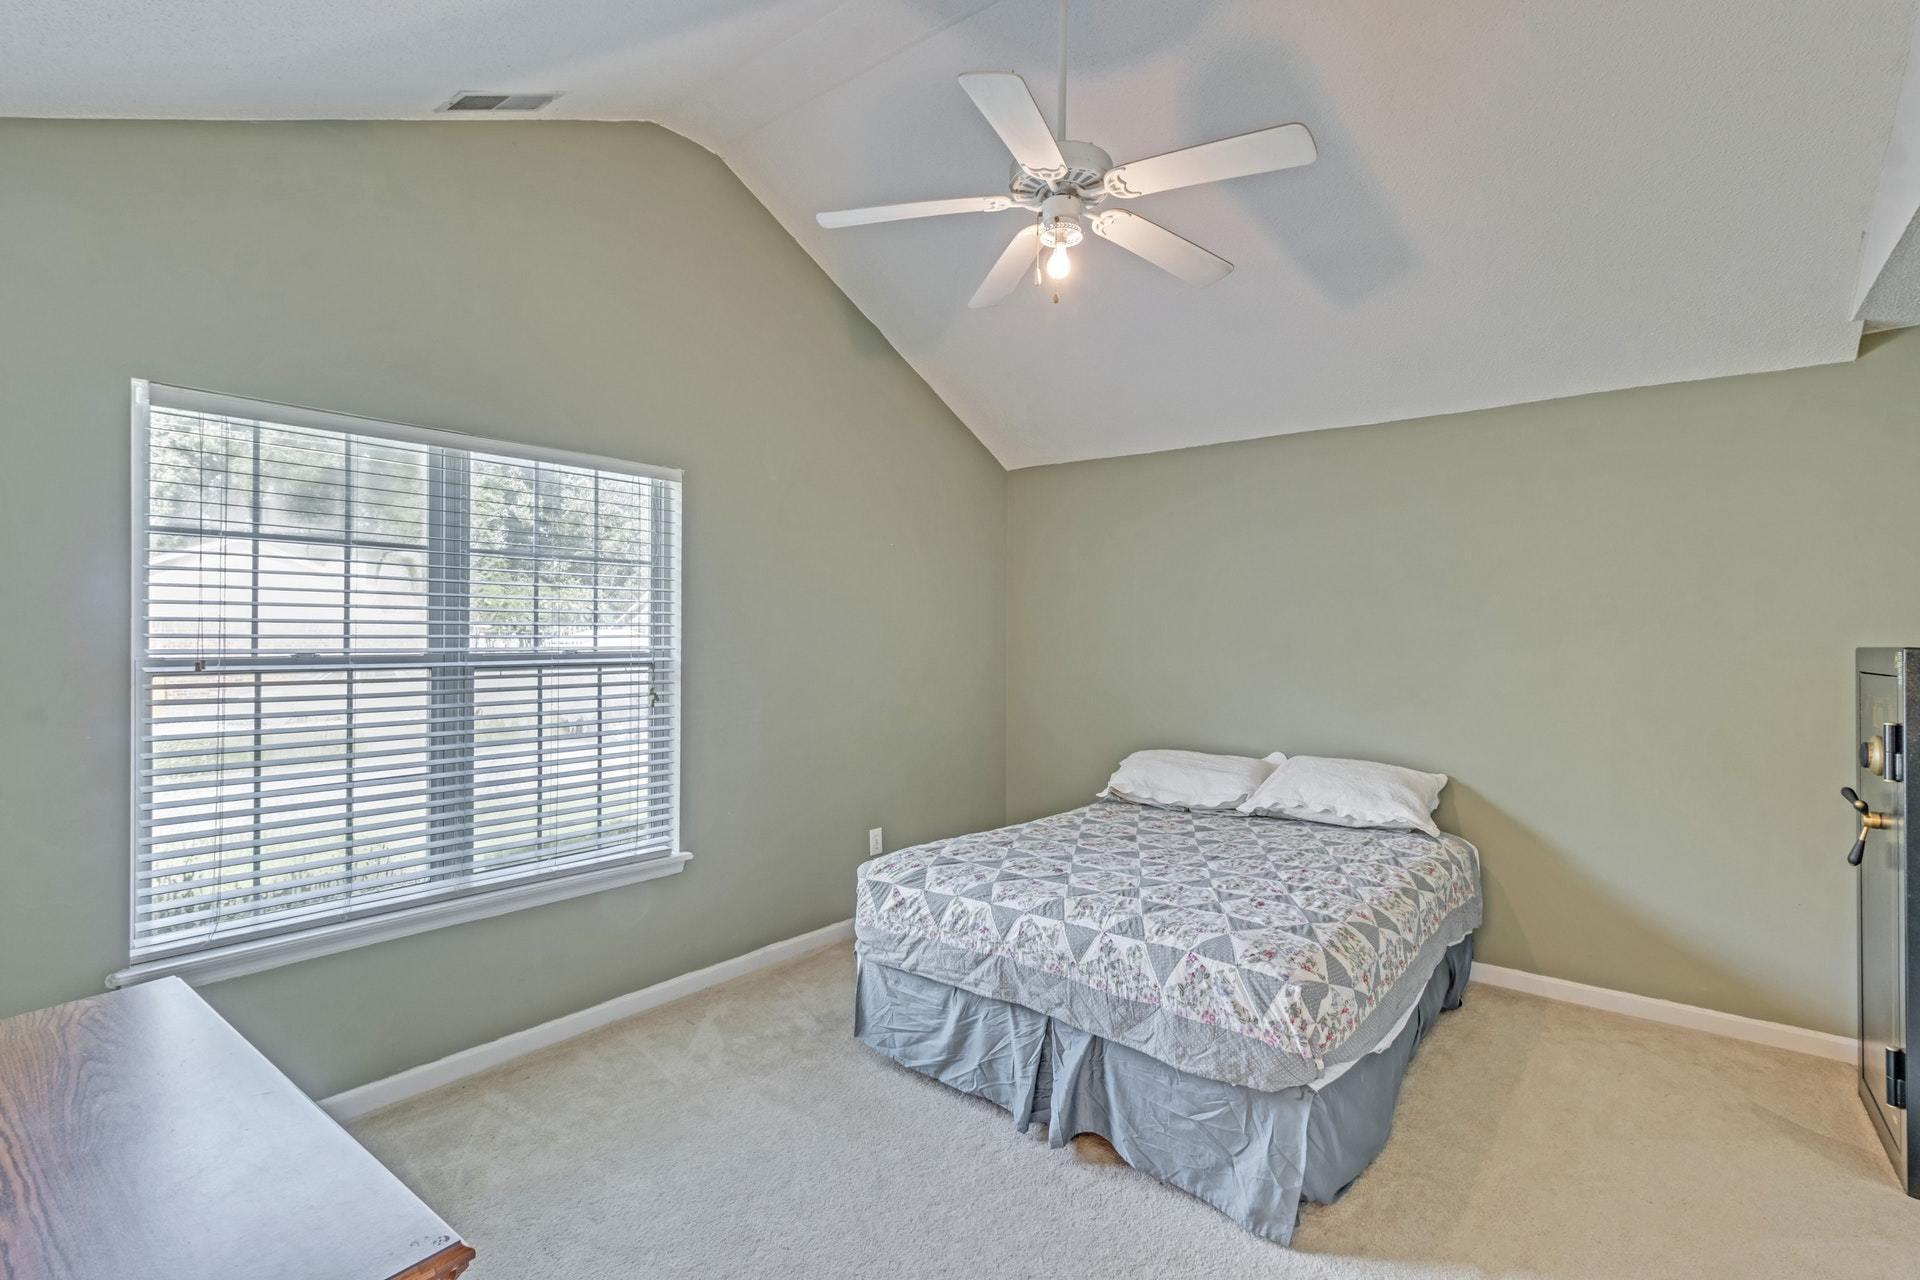 Double Oaks Homes For Sale - 2402 Double Oak, Charleston, SC - 11